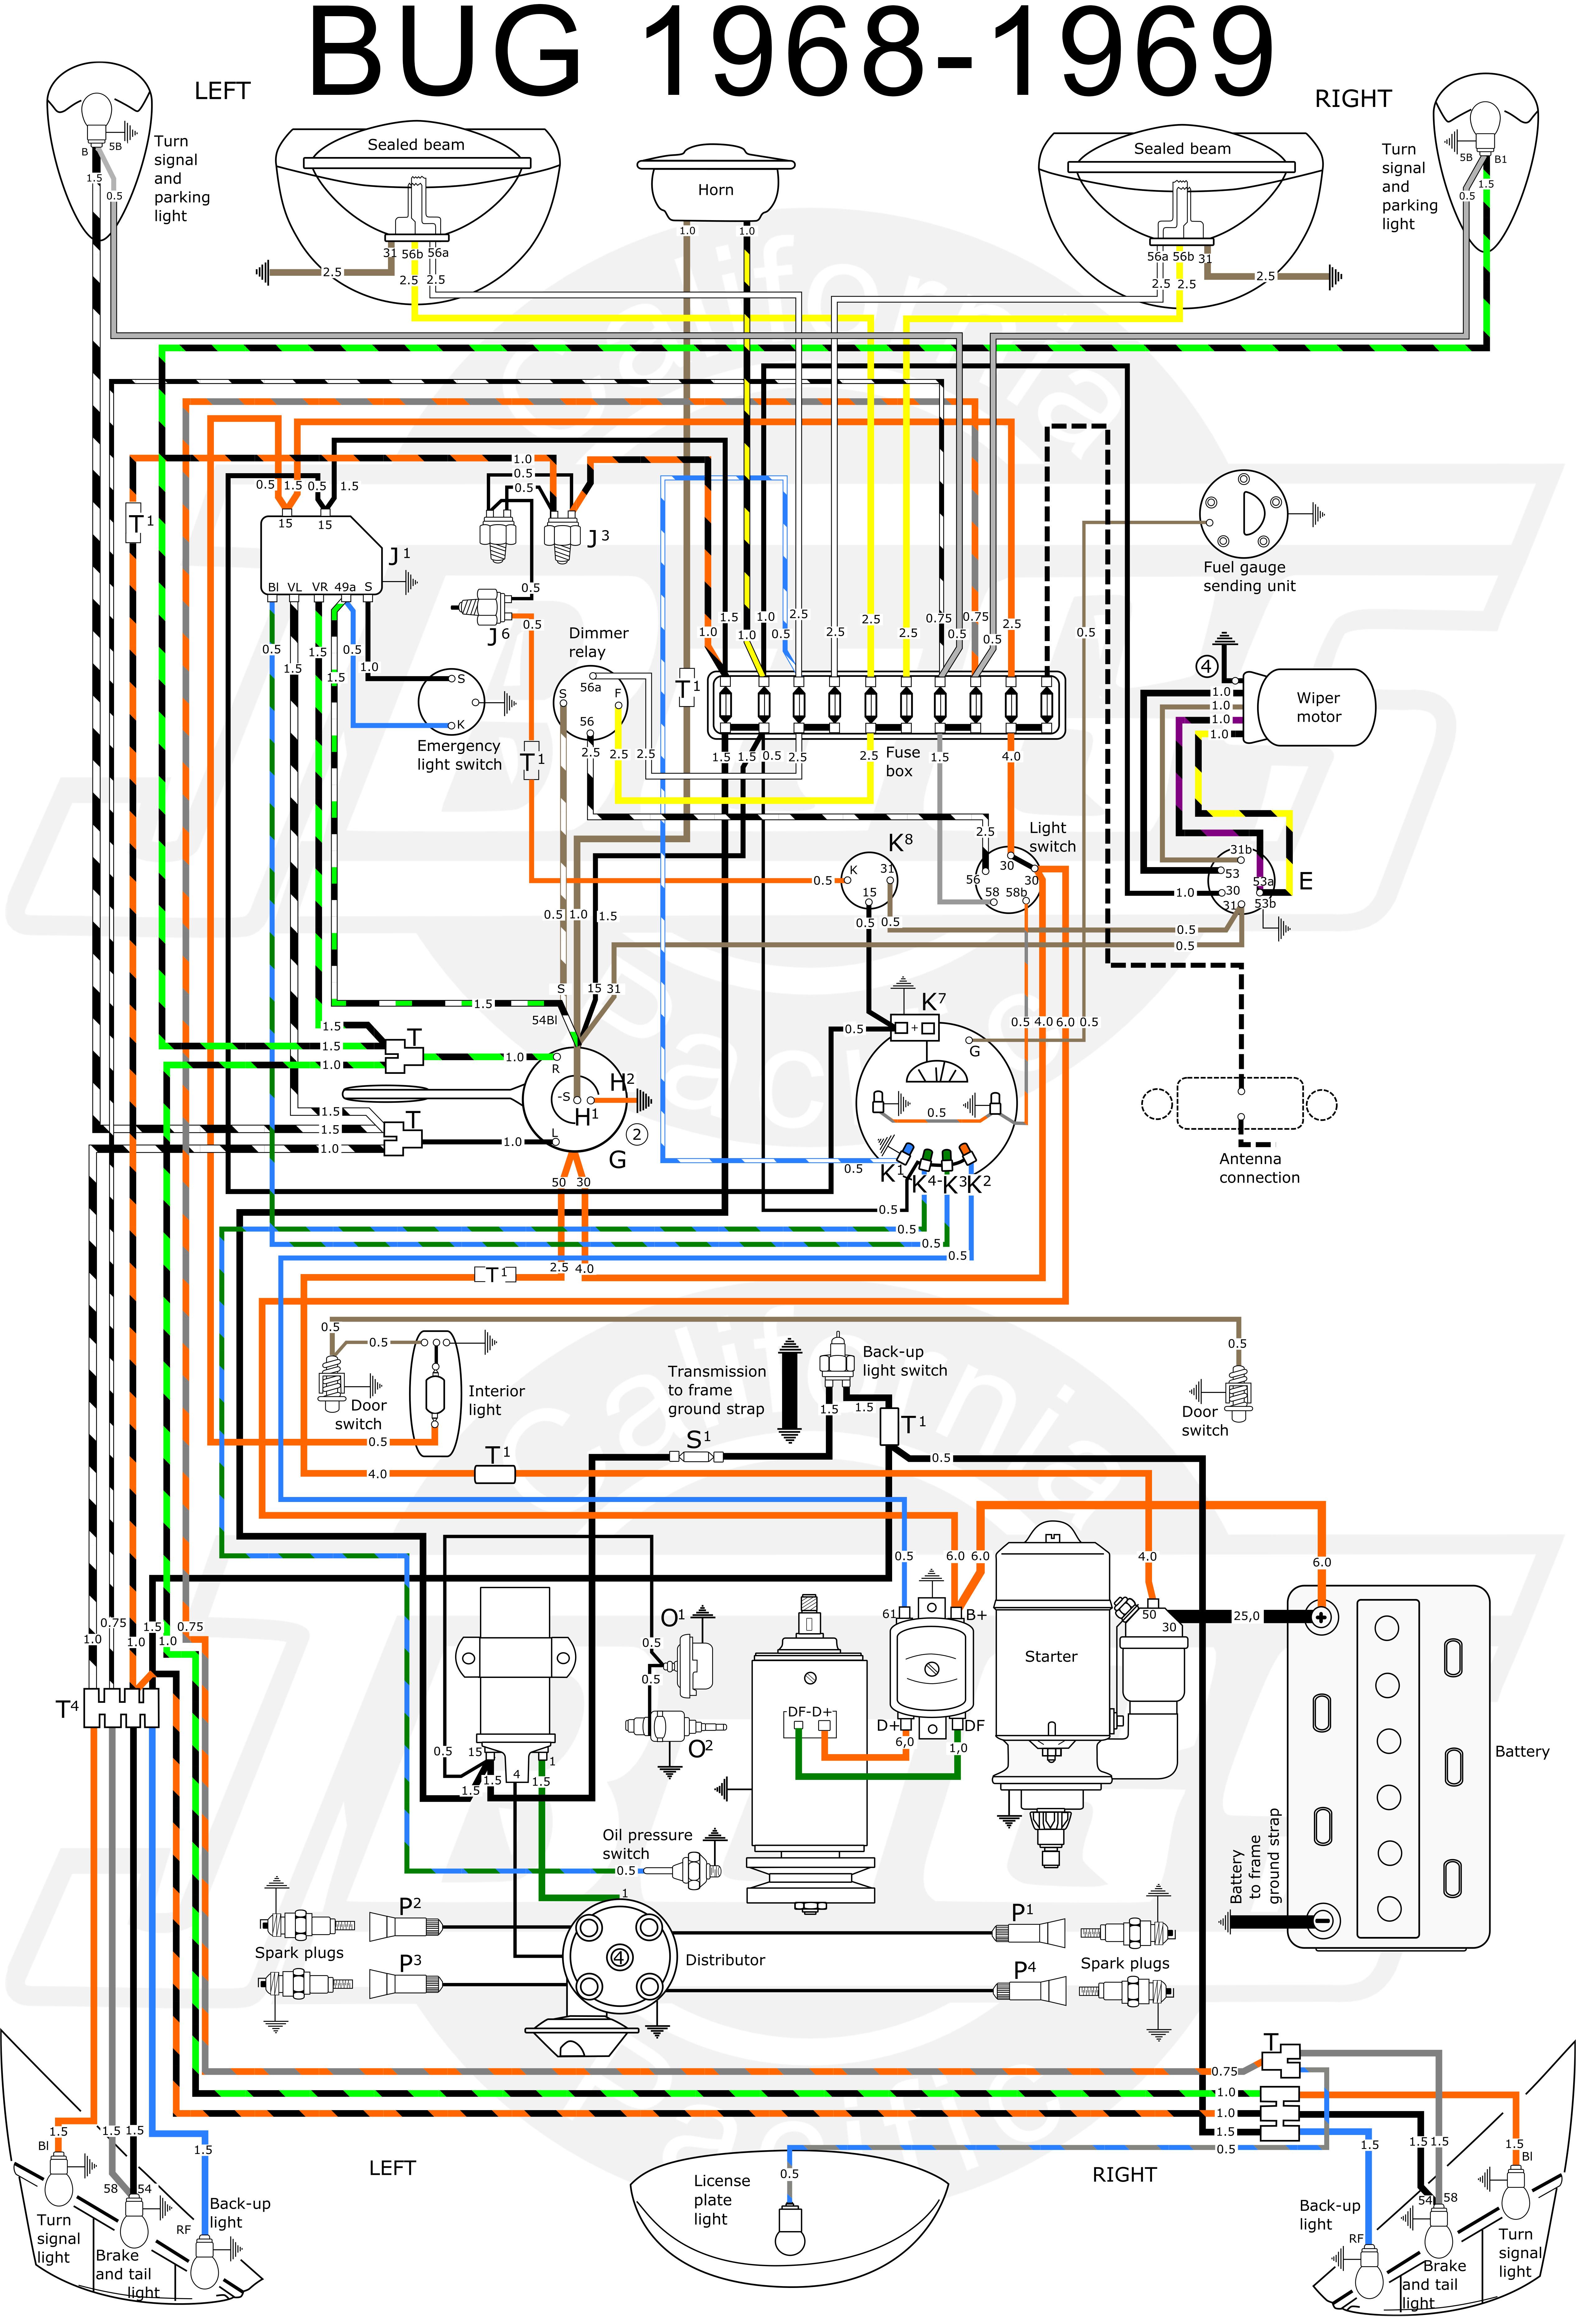 VB_3952] 71 Maverick Wiring Diagram Free DiagramUnbe Impa Over Pimpaps Terch Xeira Lacu Itis Mohammedshrine Librar Wiring  101